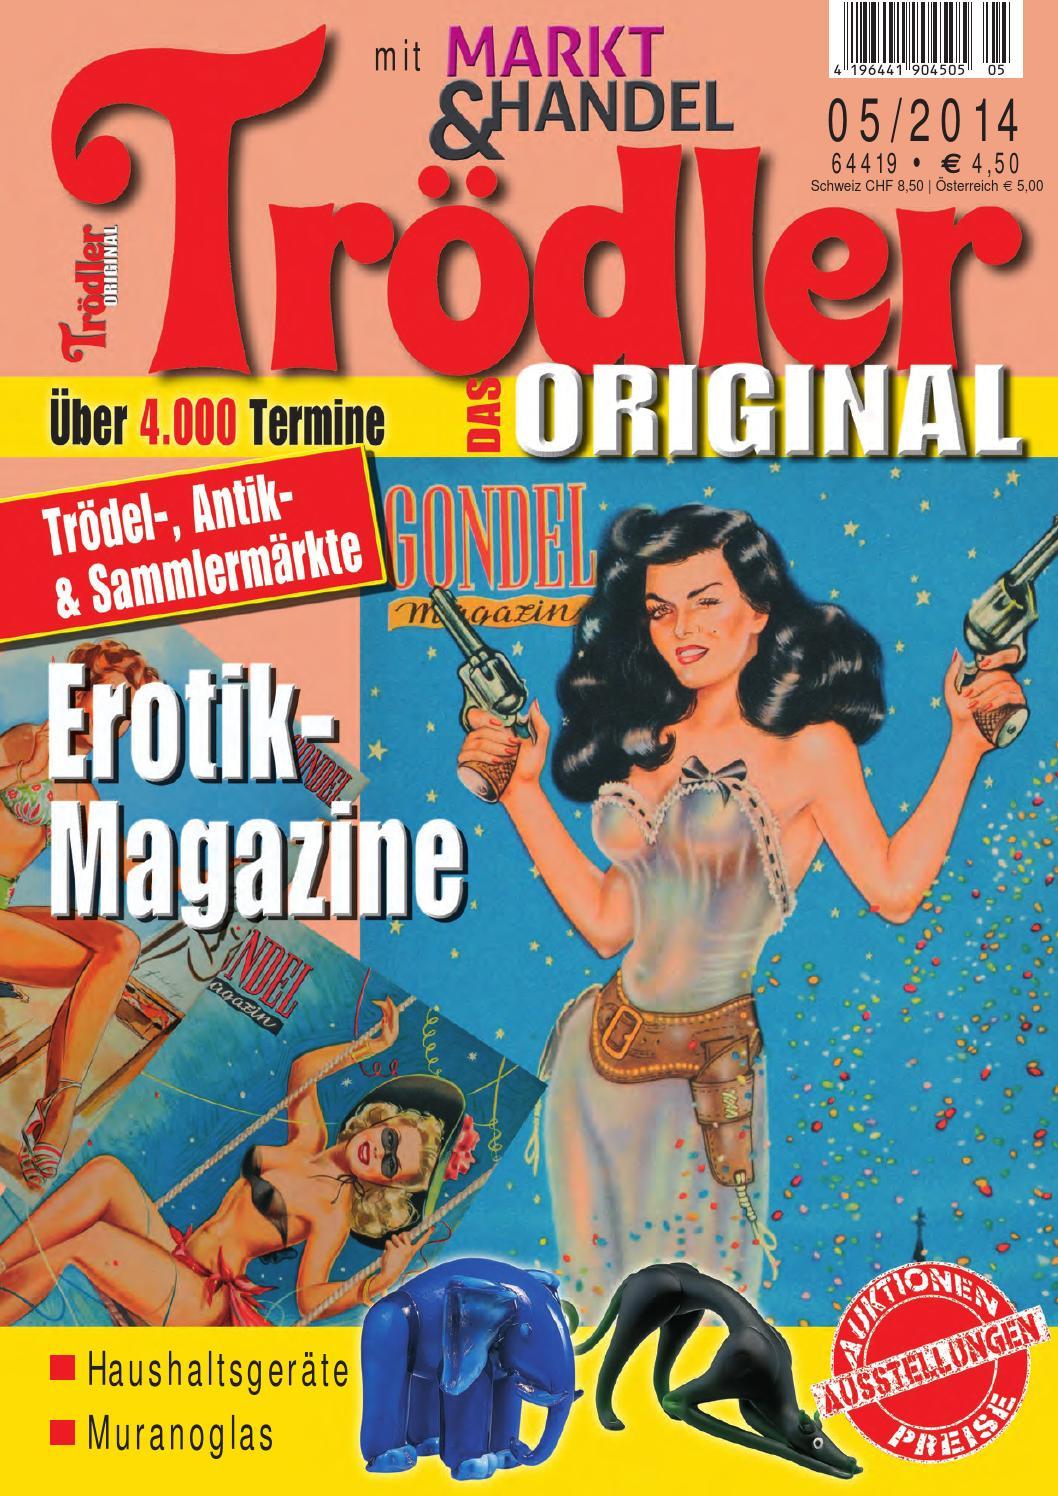 Troedler 0514 by Gemi Verlags GmbH - issuu